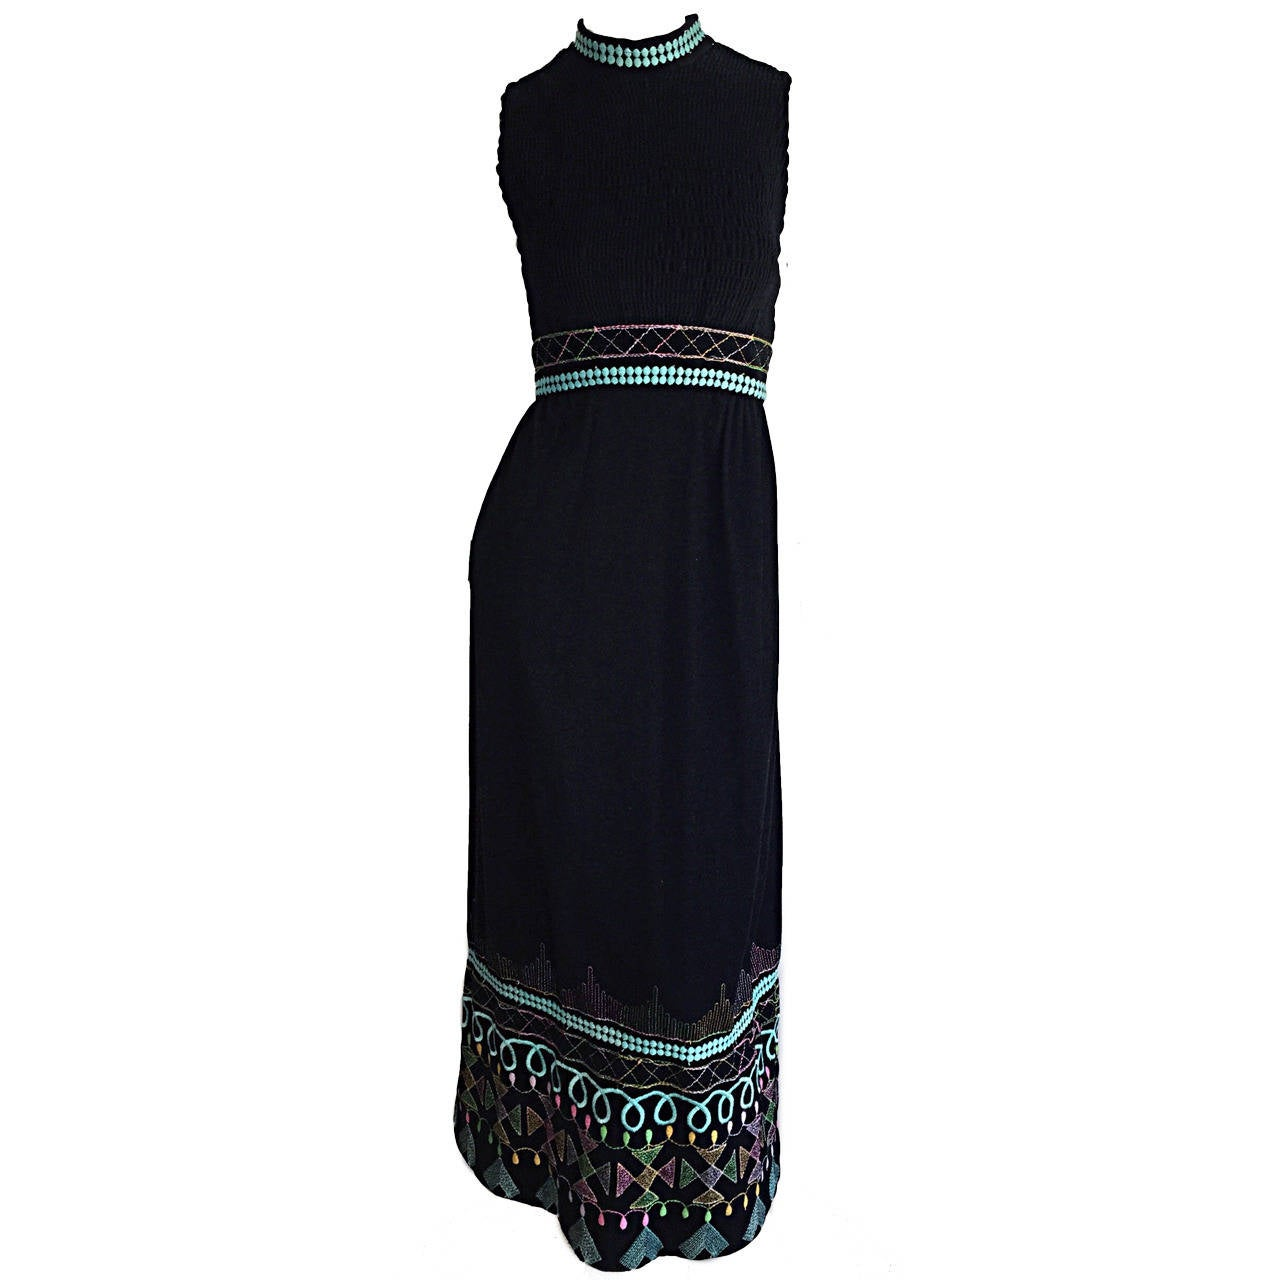 1970s Sandine Originals I. Magnin Black Embroidered Colorful Cotton Maxi Dress